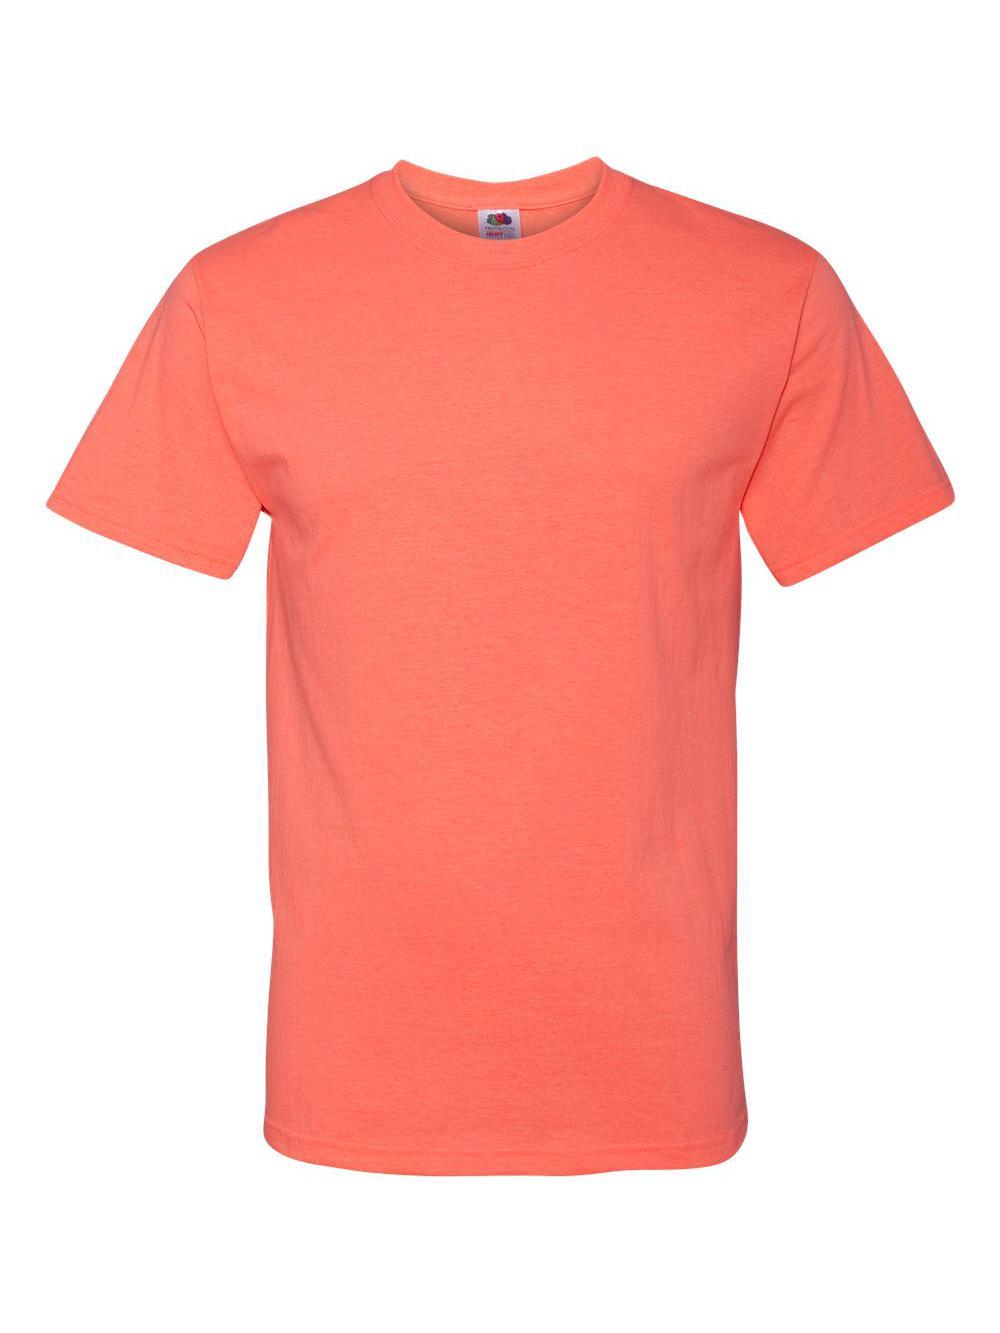 Fruit-of-the-Loom-HD-Cotton-Short-Sleeve-T-Shirt-3930R thumbnail 96